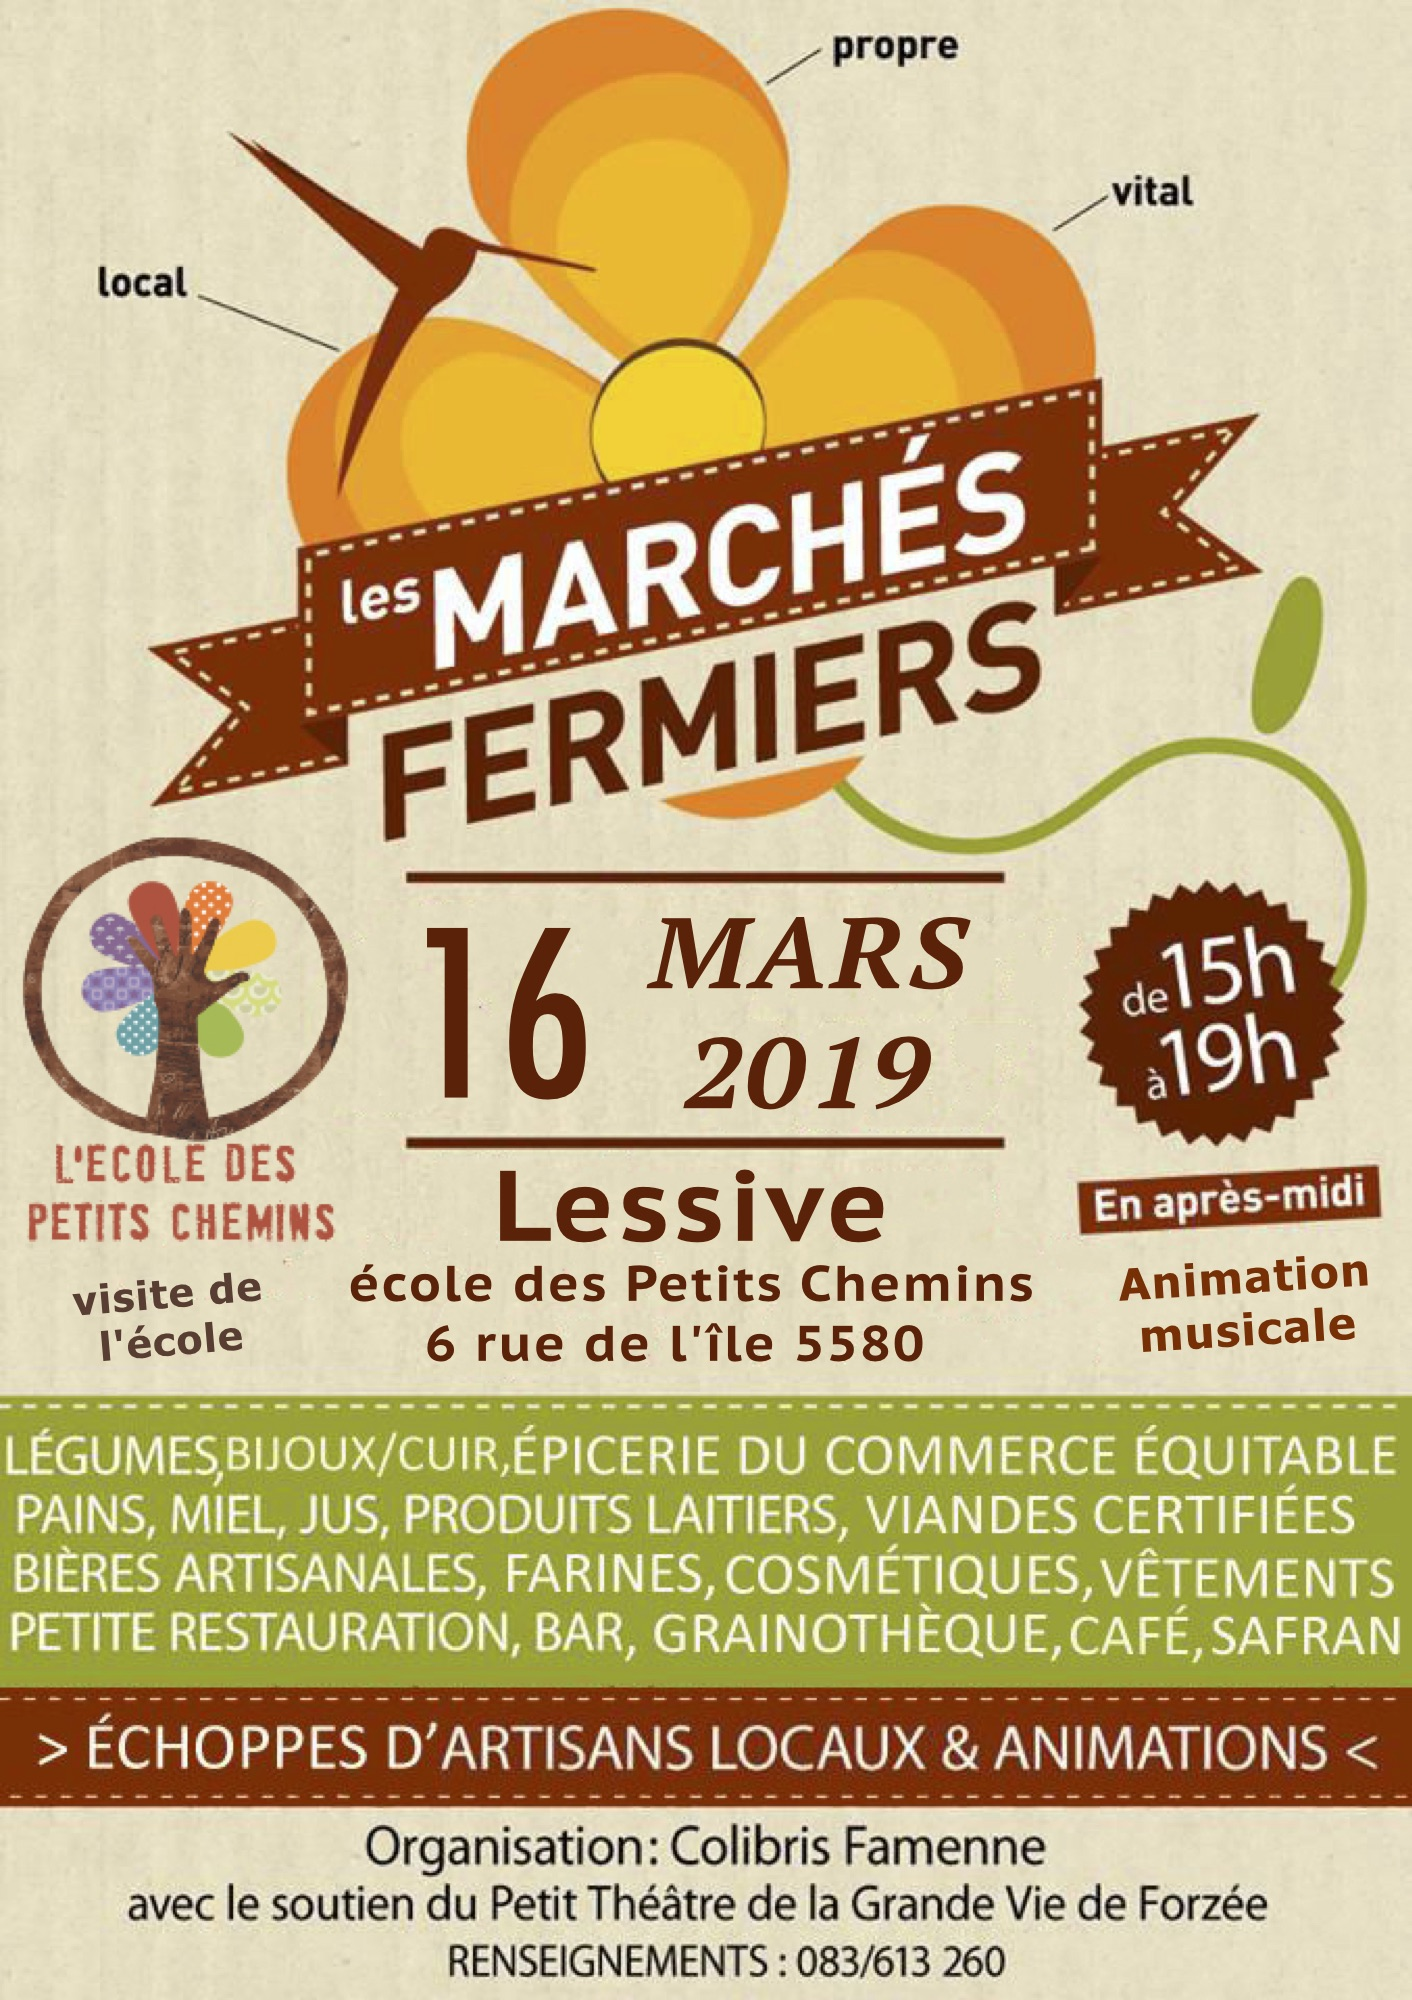 image Lessive_March_fermier_16_MARS_logo.jpg (0.6MB)